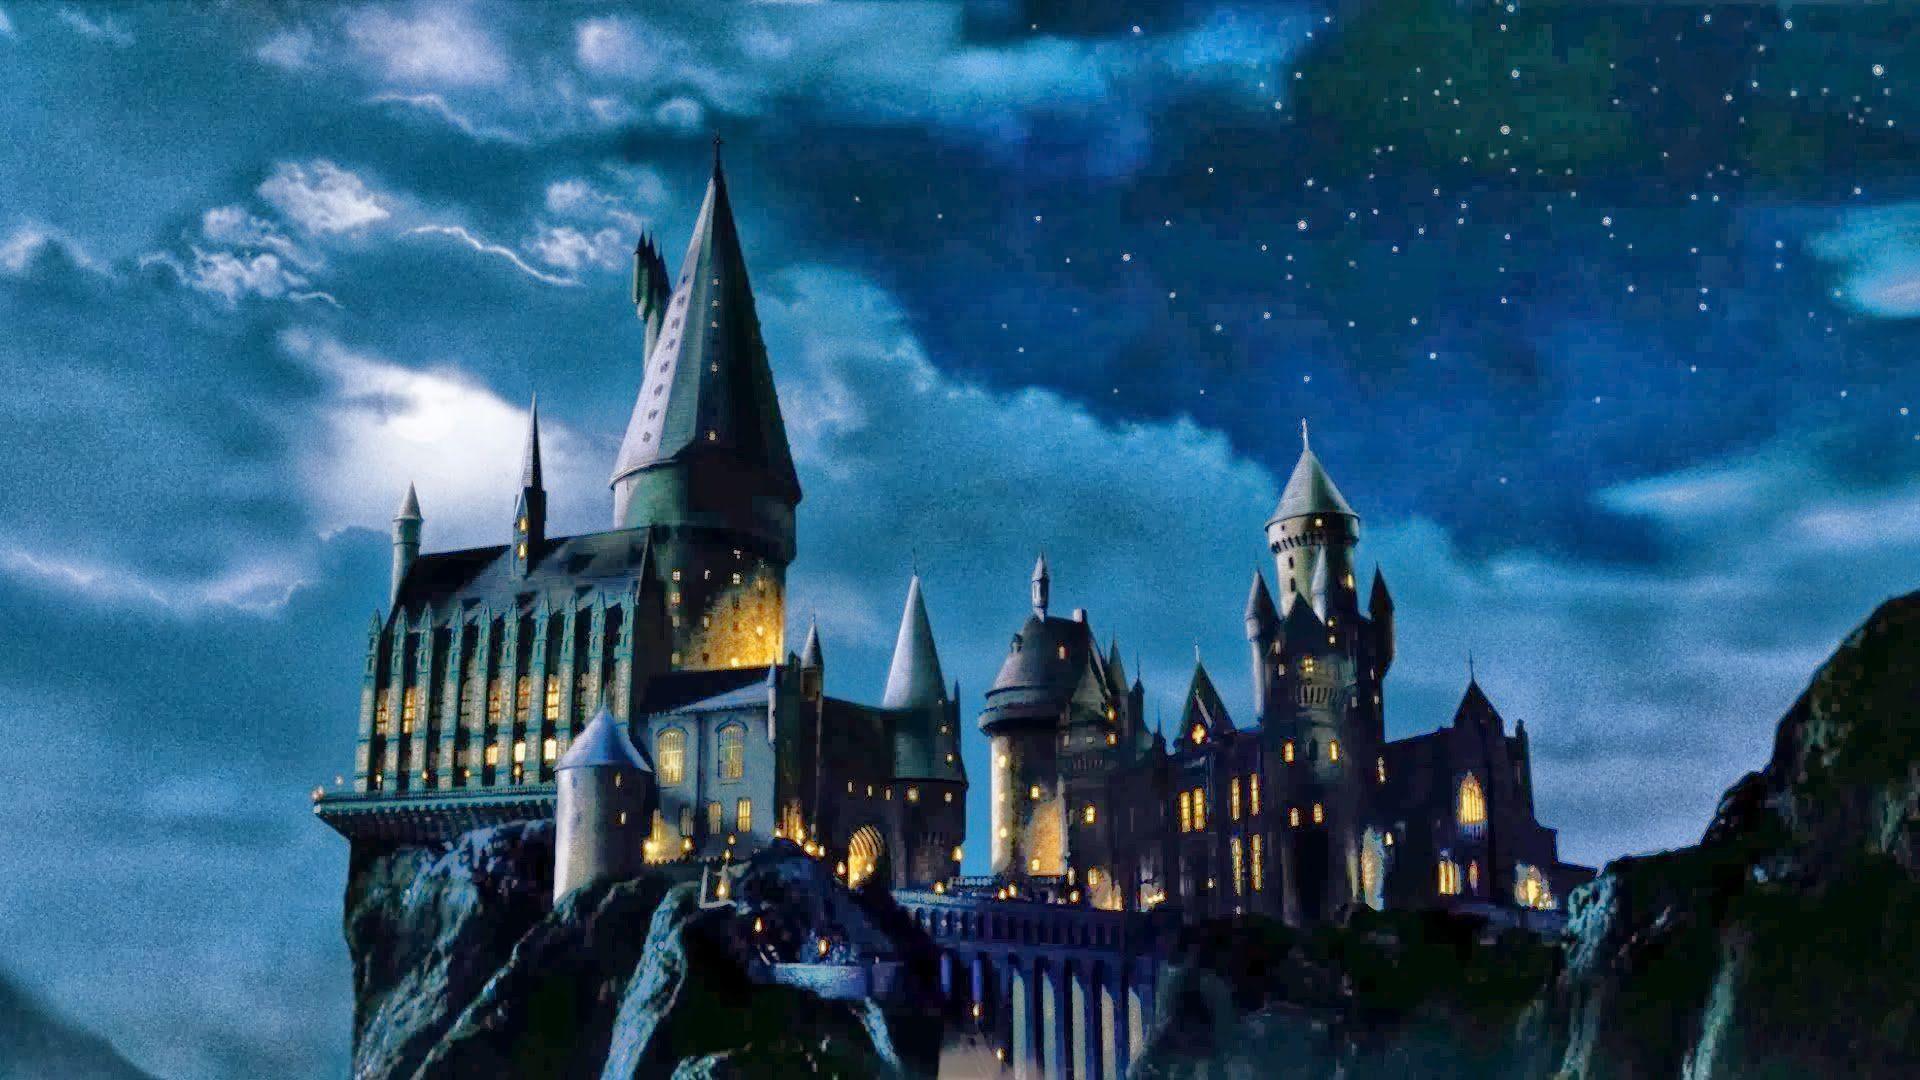 Hogwarts Castle Hd Wallpaper Desktop Wallpaper Harry Potter Harry Potter Background Harry Potter Wallpaper